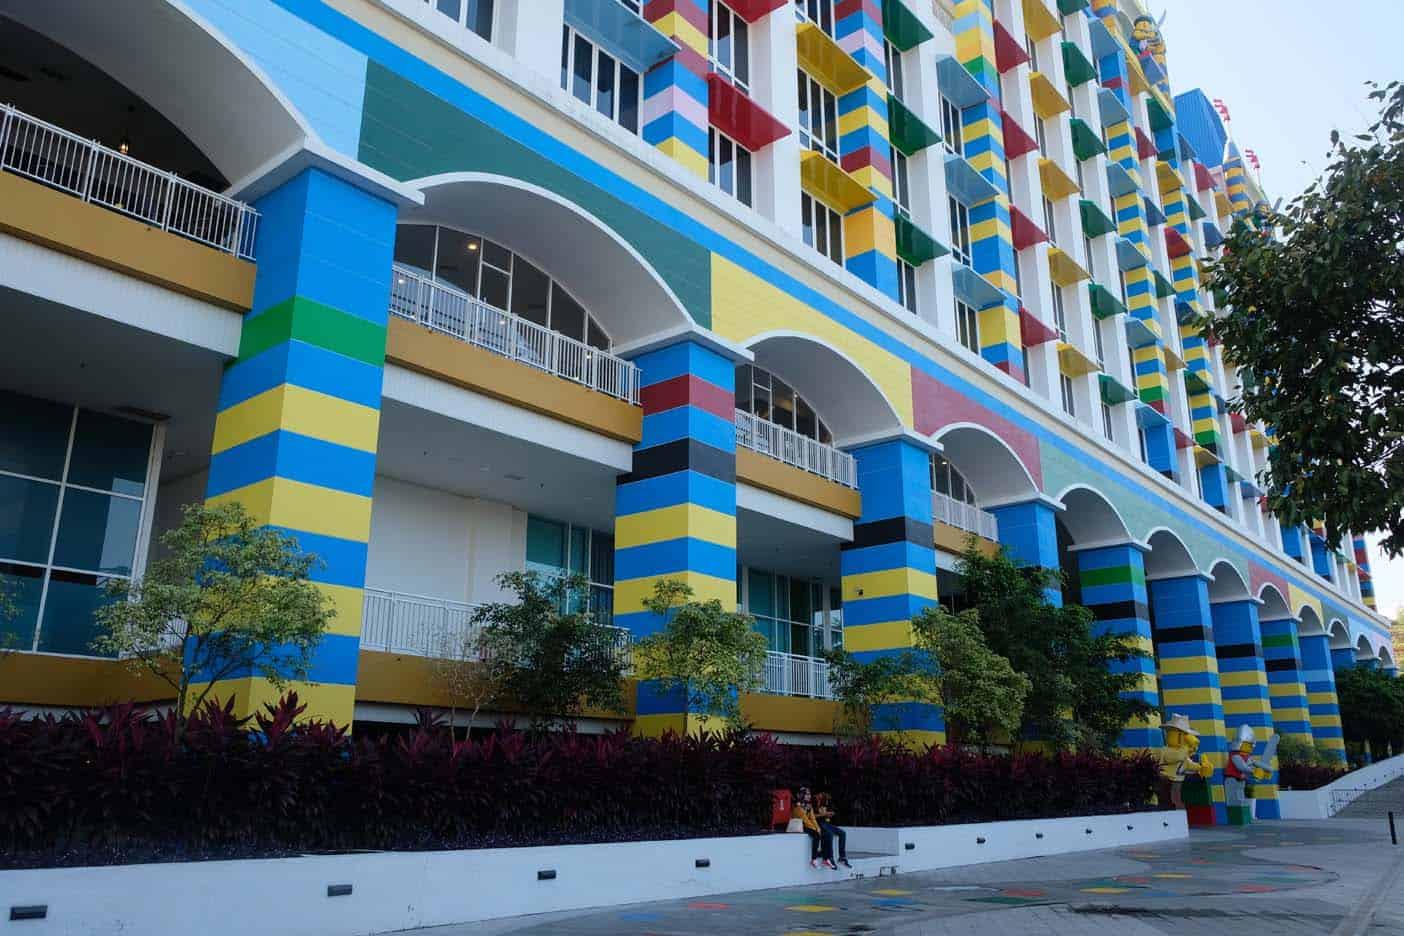 legoland malesie pretpark en hotel